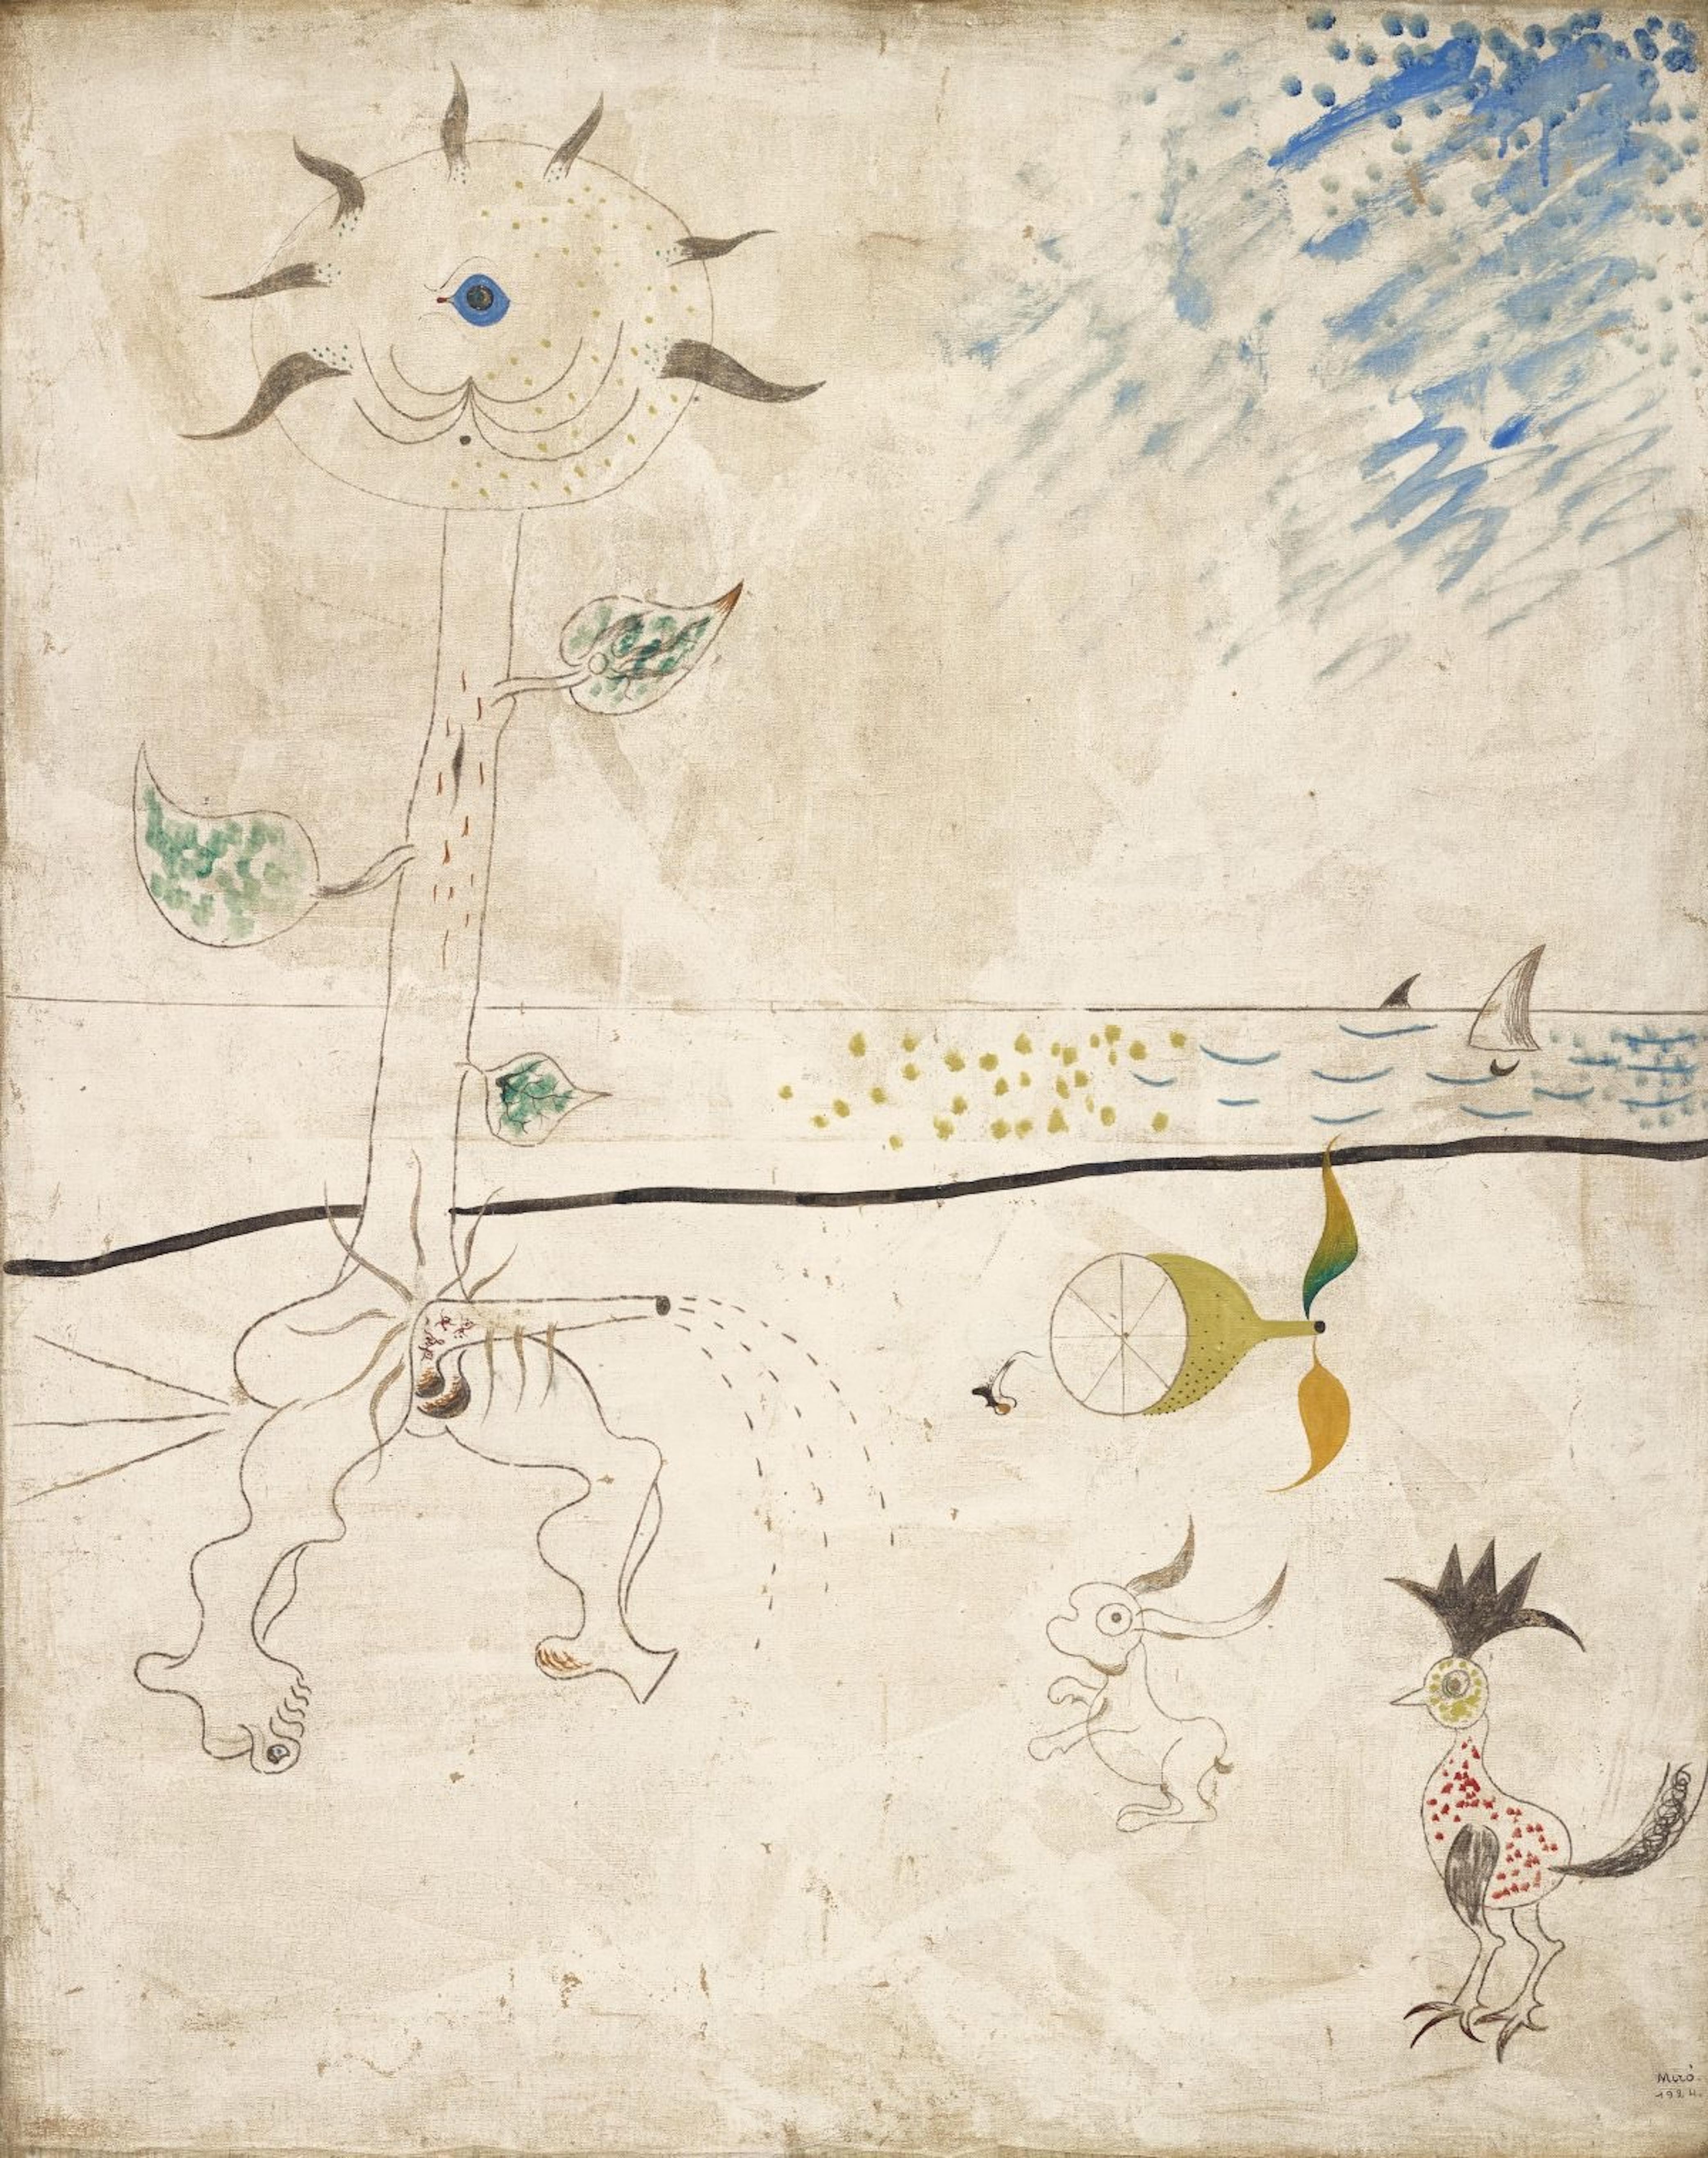 'Le Piège', óleo sobre lienzo de 92 x 73 centímentros pintado por Joan Miró en 1924.